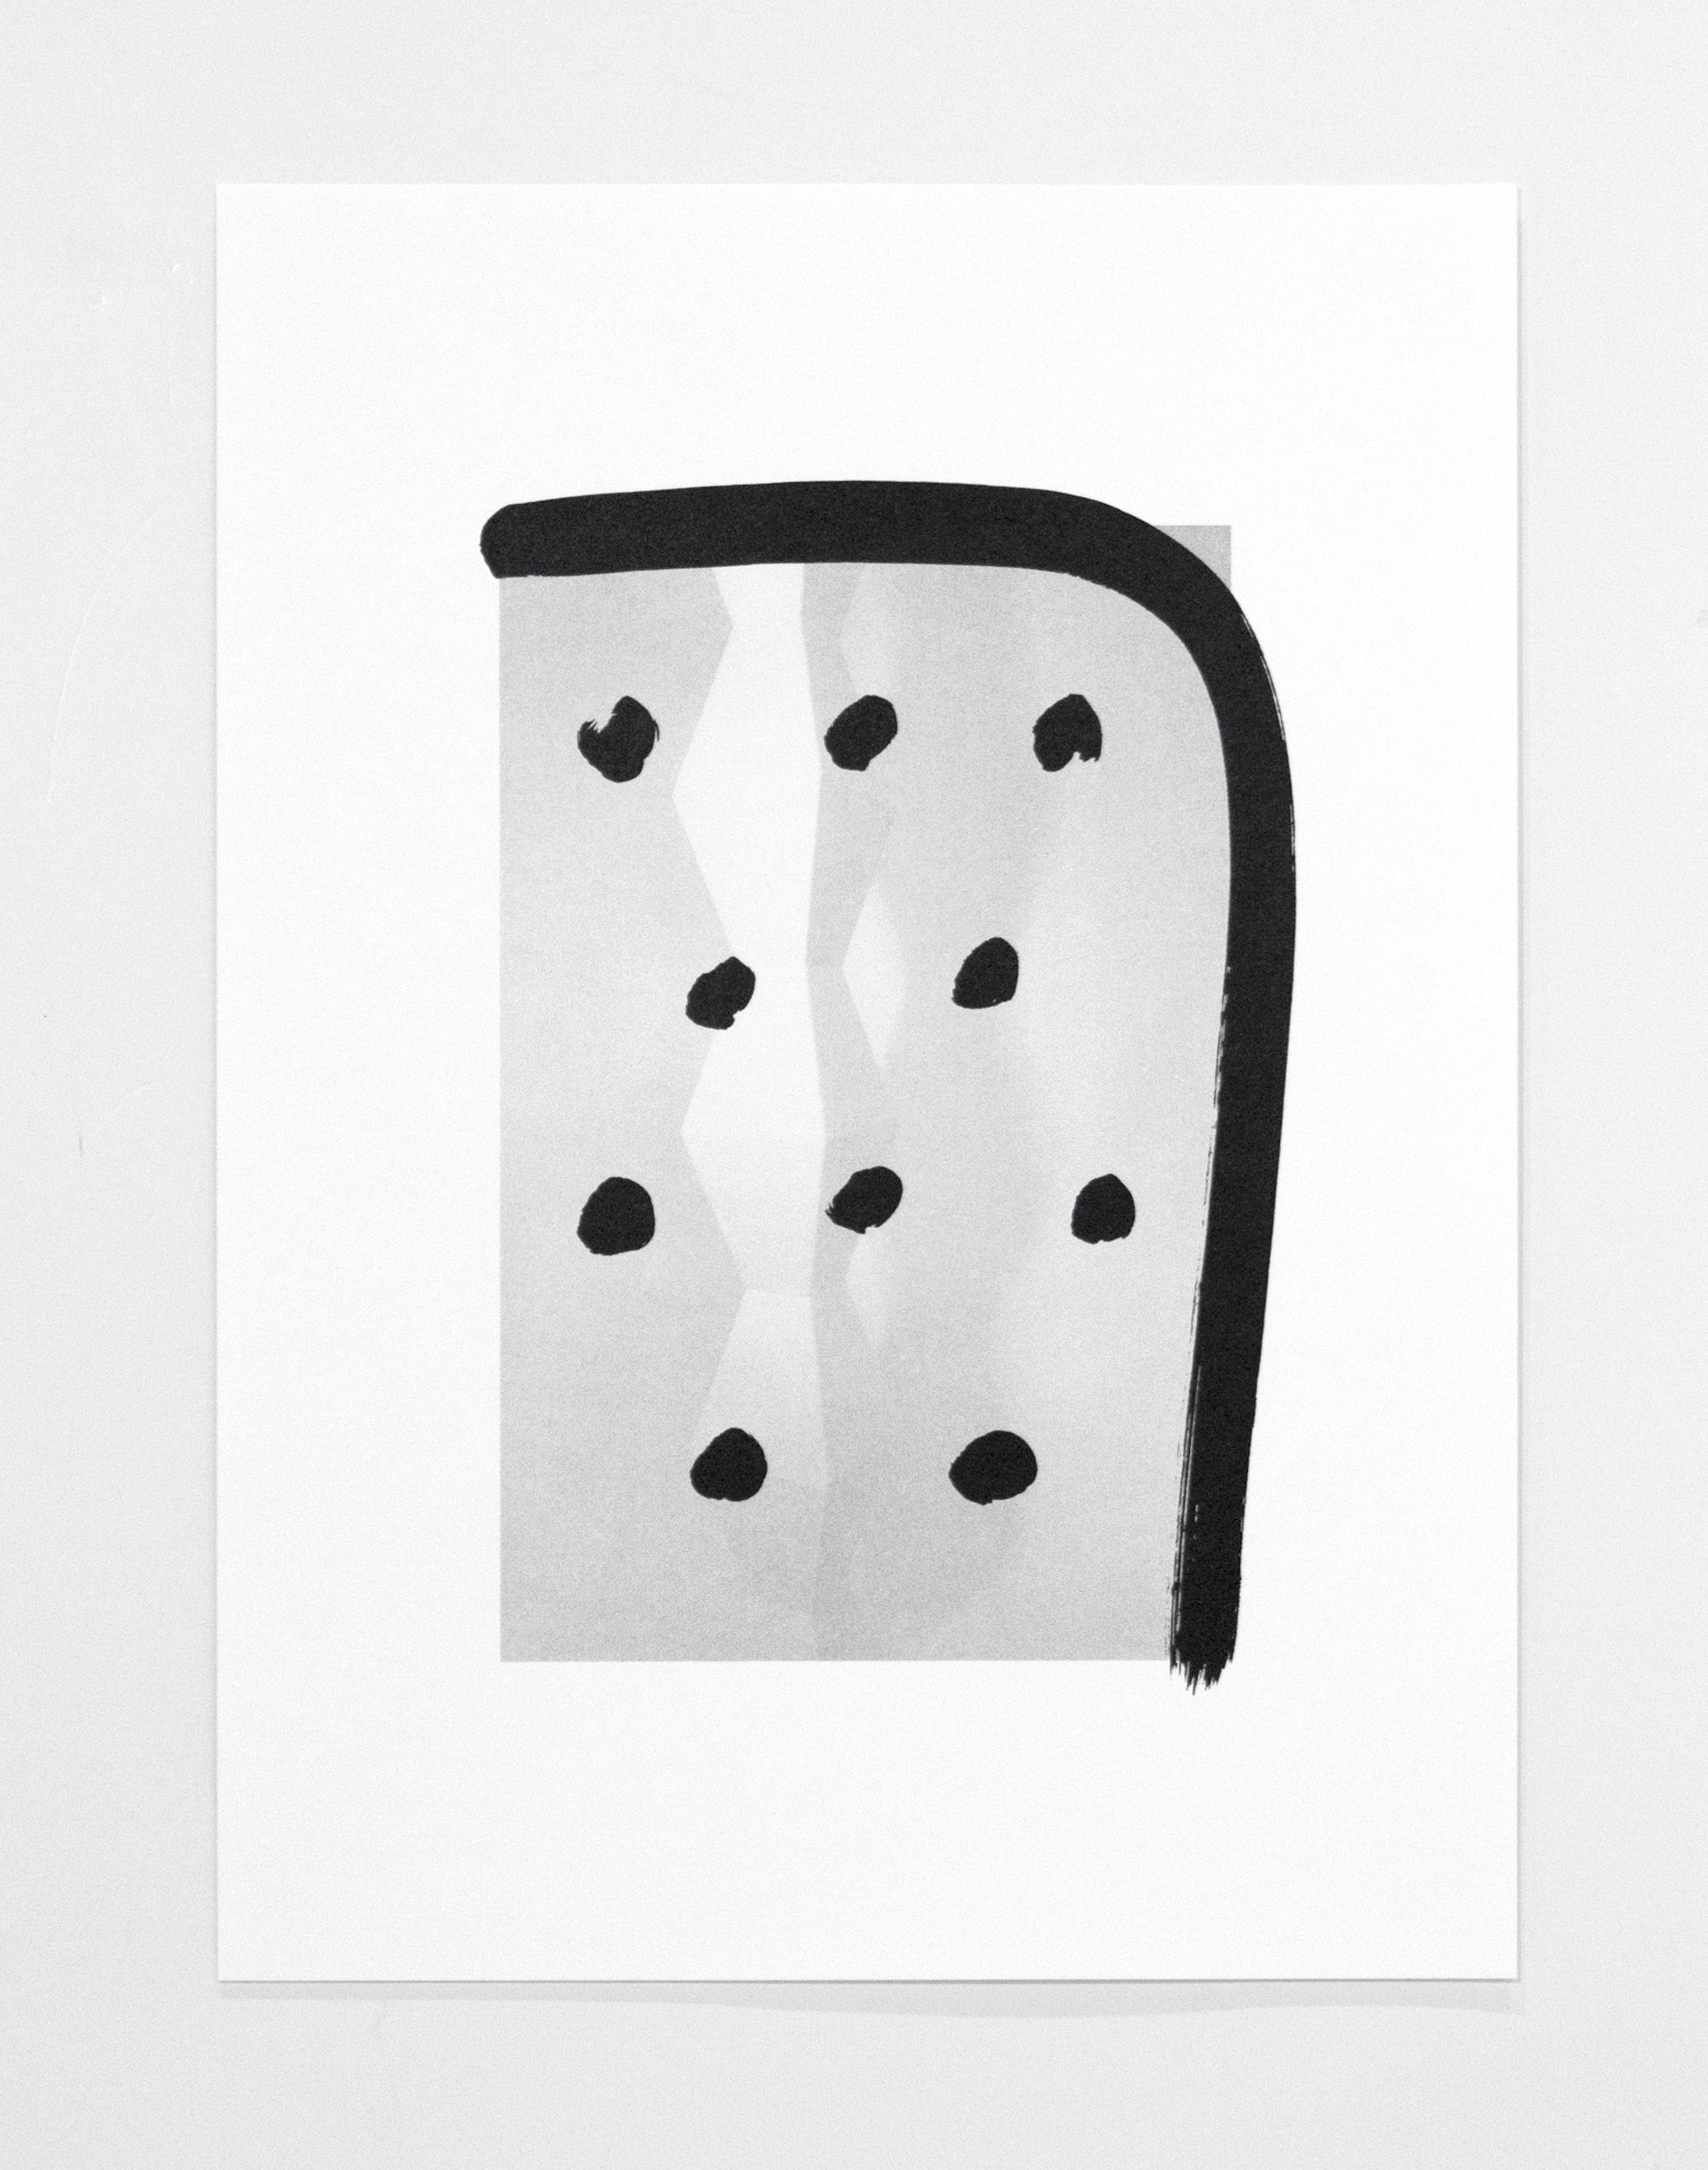 Margaret Lee, [untitled] White Columns 2015 Print Portfolio, 2015